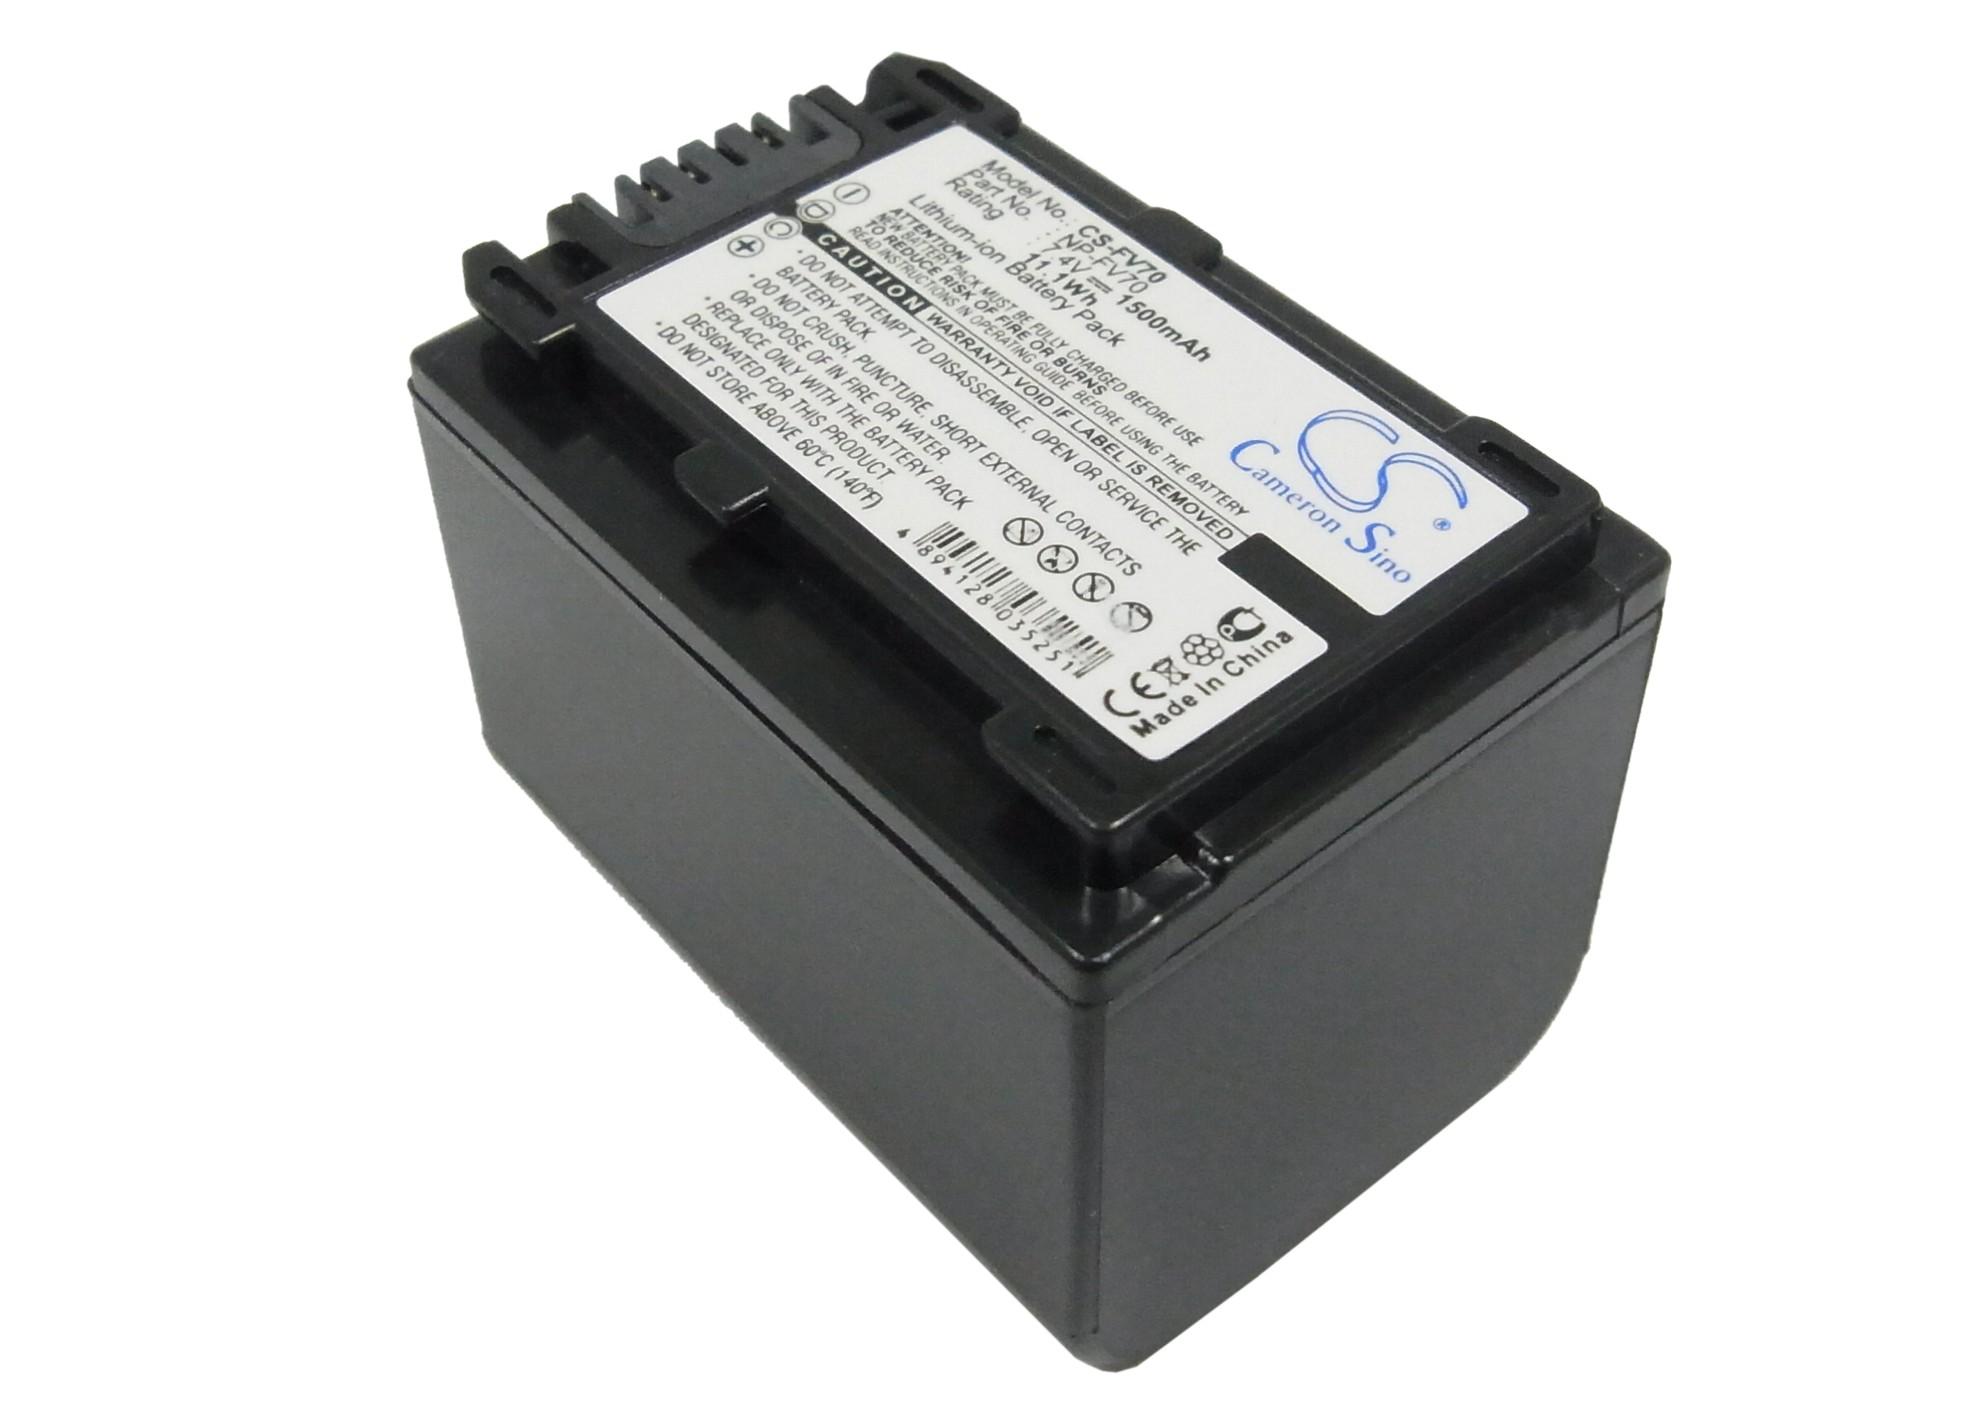 Cameron Sino baterie do kamer a fotoaparátů pro SONY NEX-VG20EH 7.4V Li-ion 1500mAh černá - neoriginální